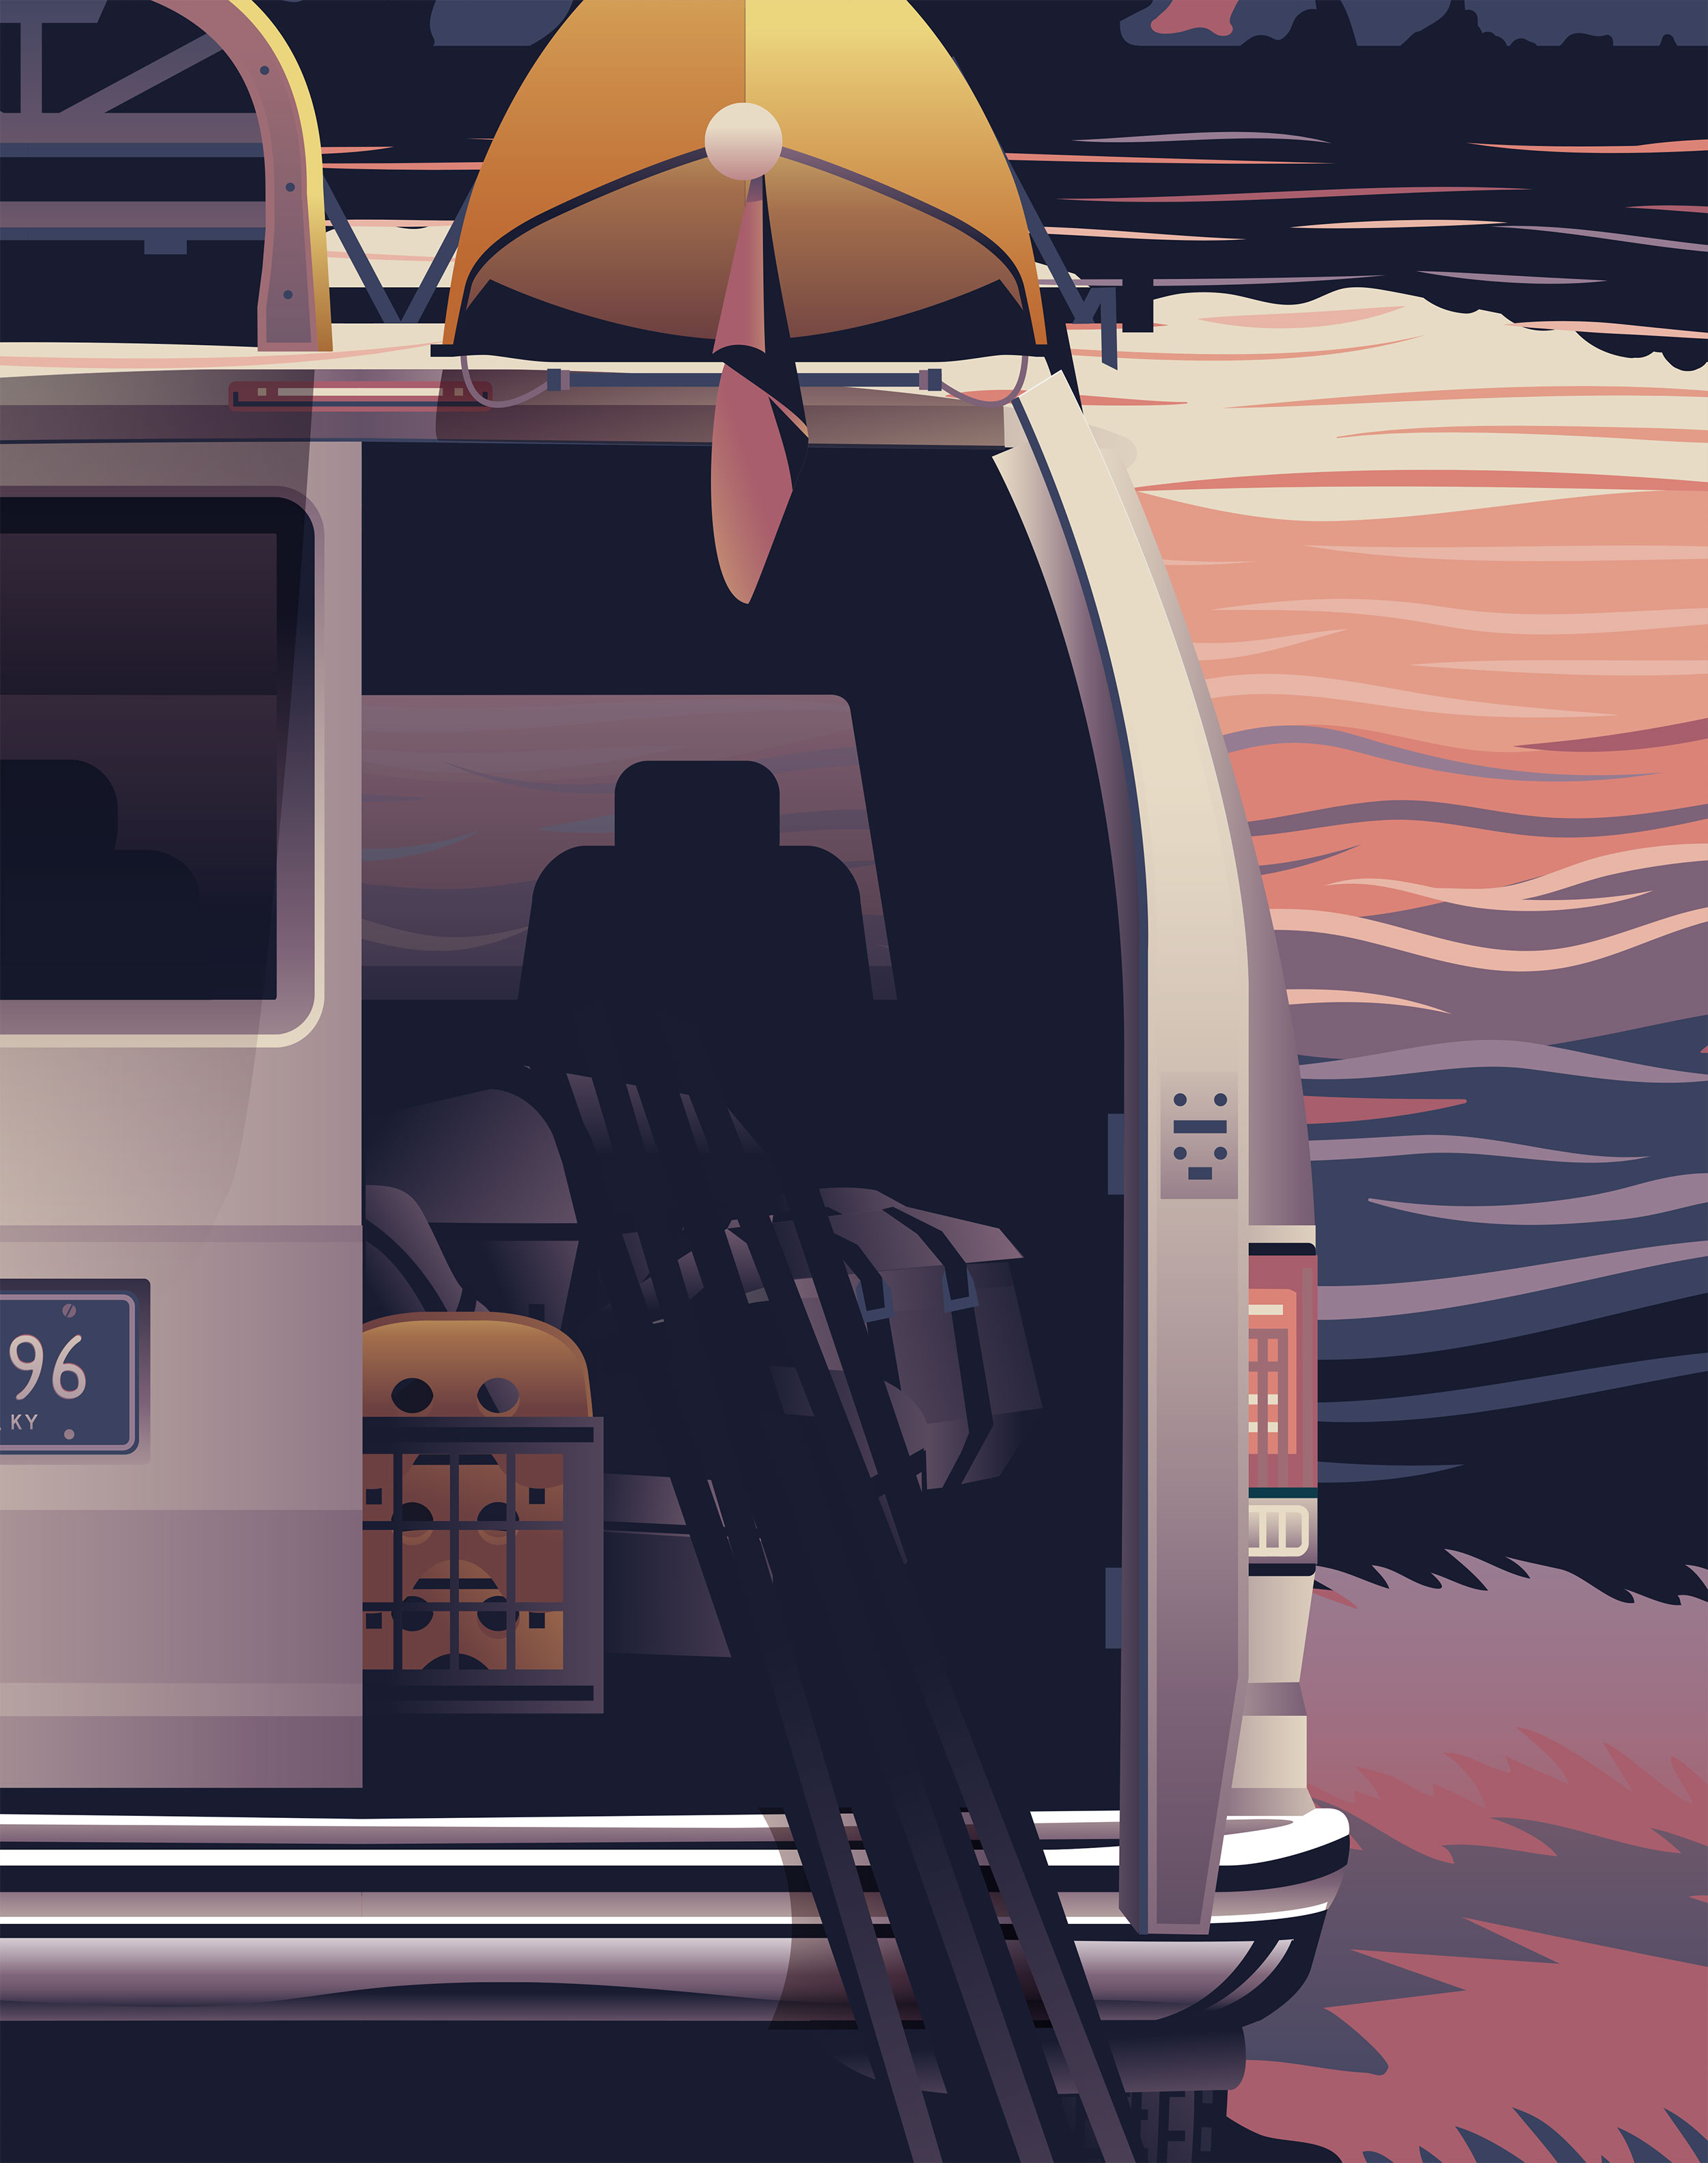 Illustrations_Posters_mockup_msu1b.jpg